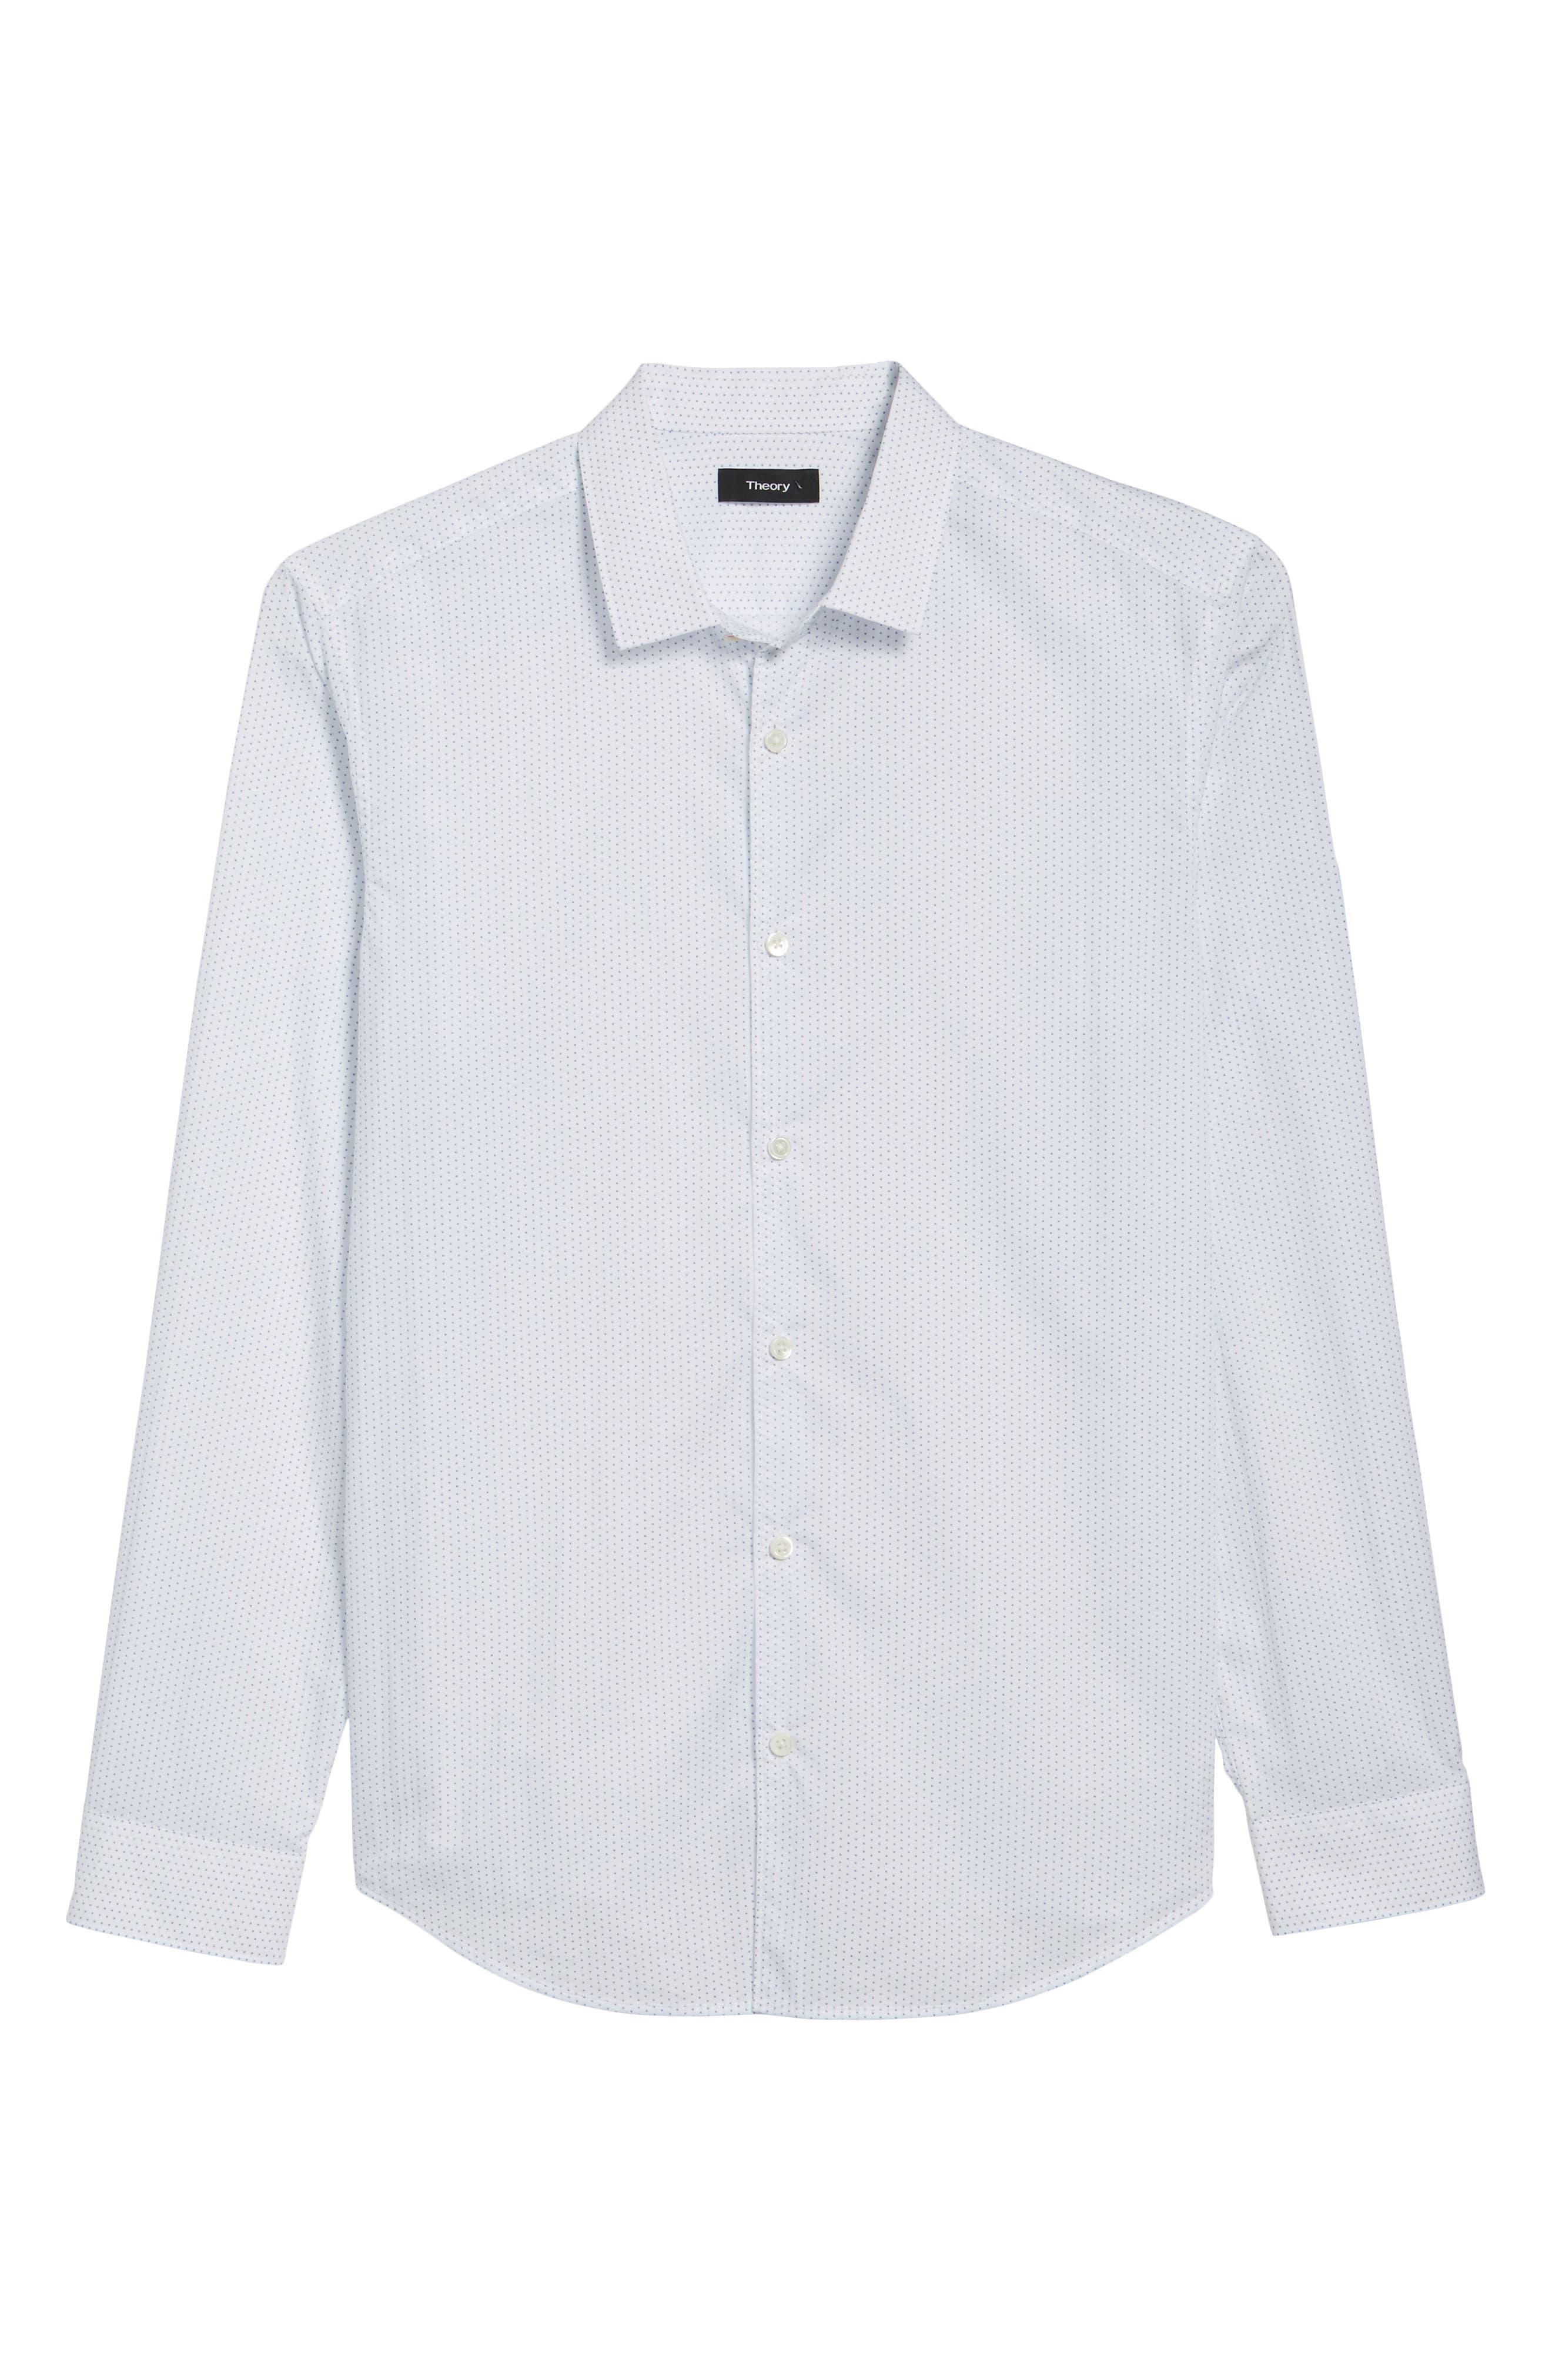 Murray Slim Fit Sport Shirt,                             Alternate thumbnail 11, color,